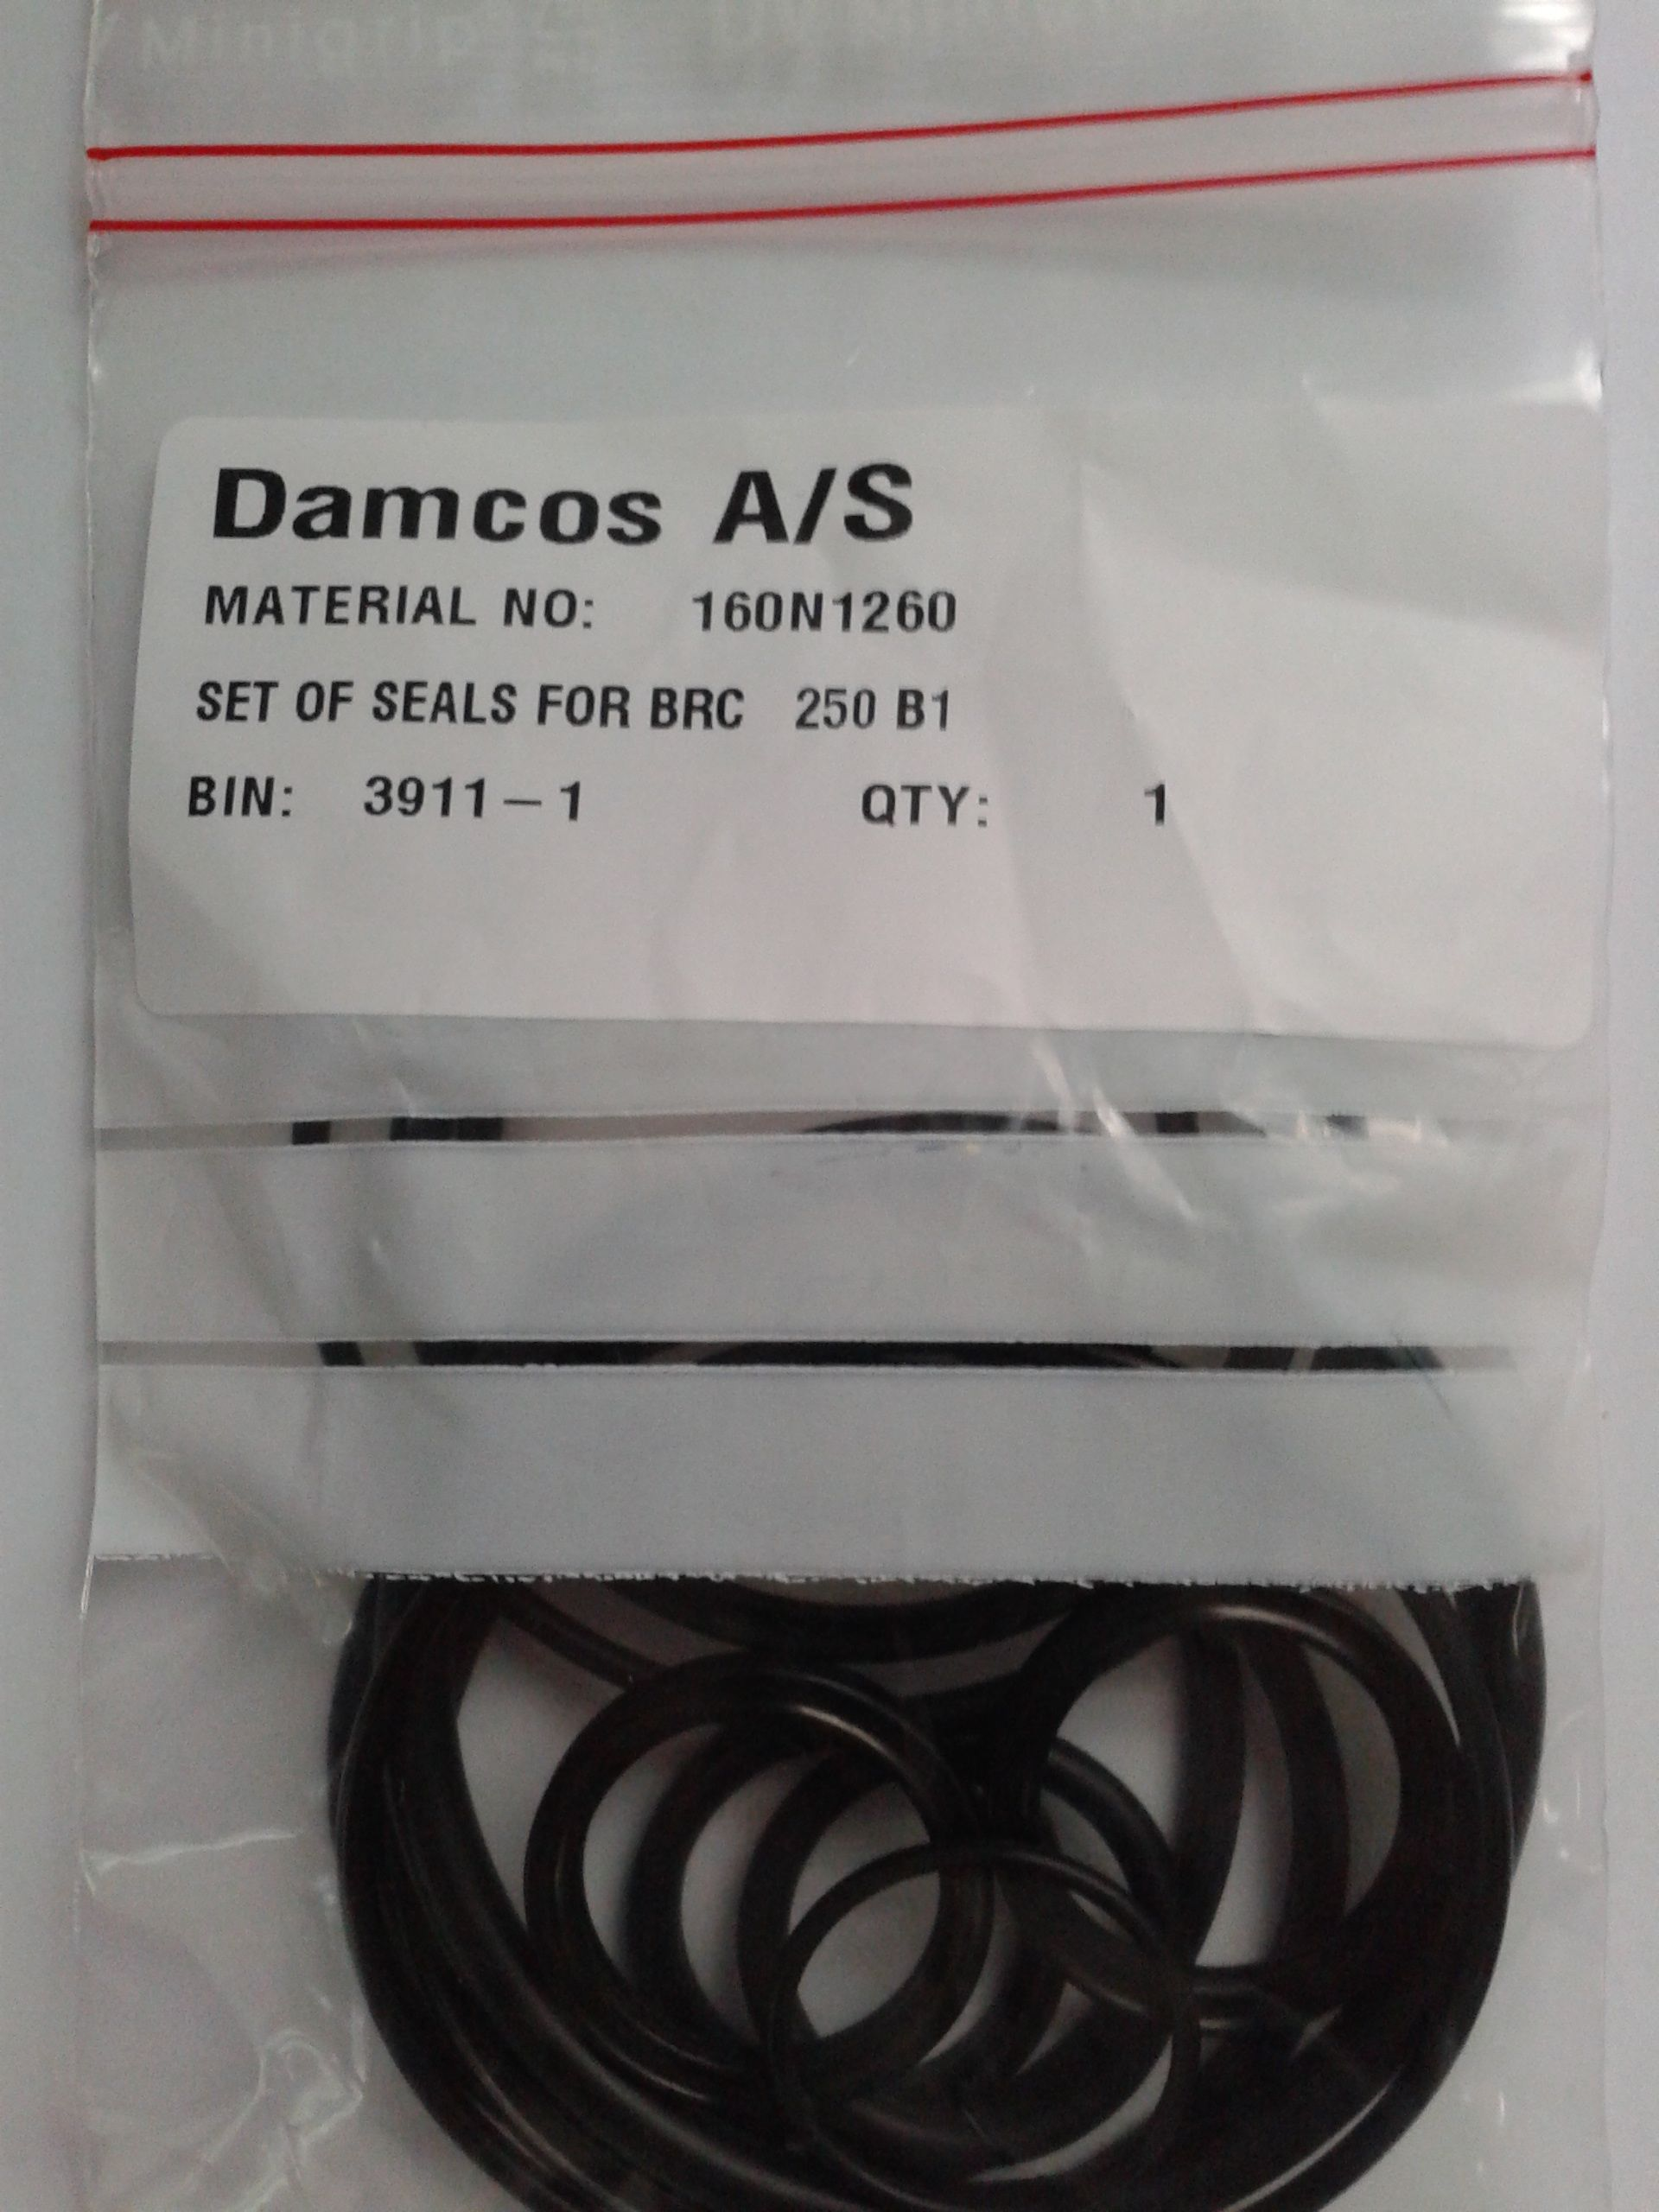 Damcos-Danfoss-BRC-250-B1-Actuator-Seal-Kit-160N1260-